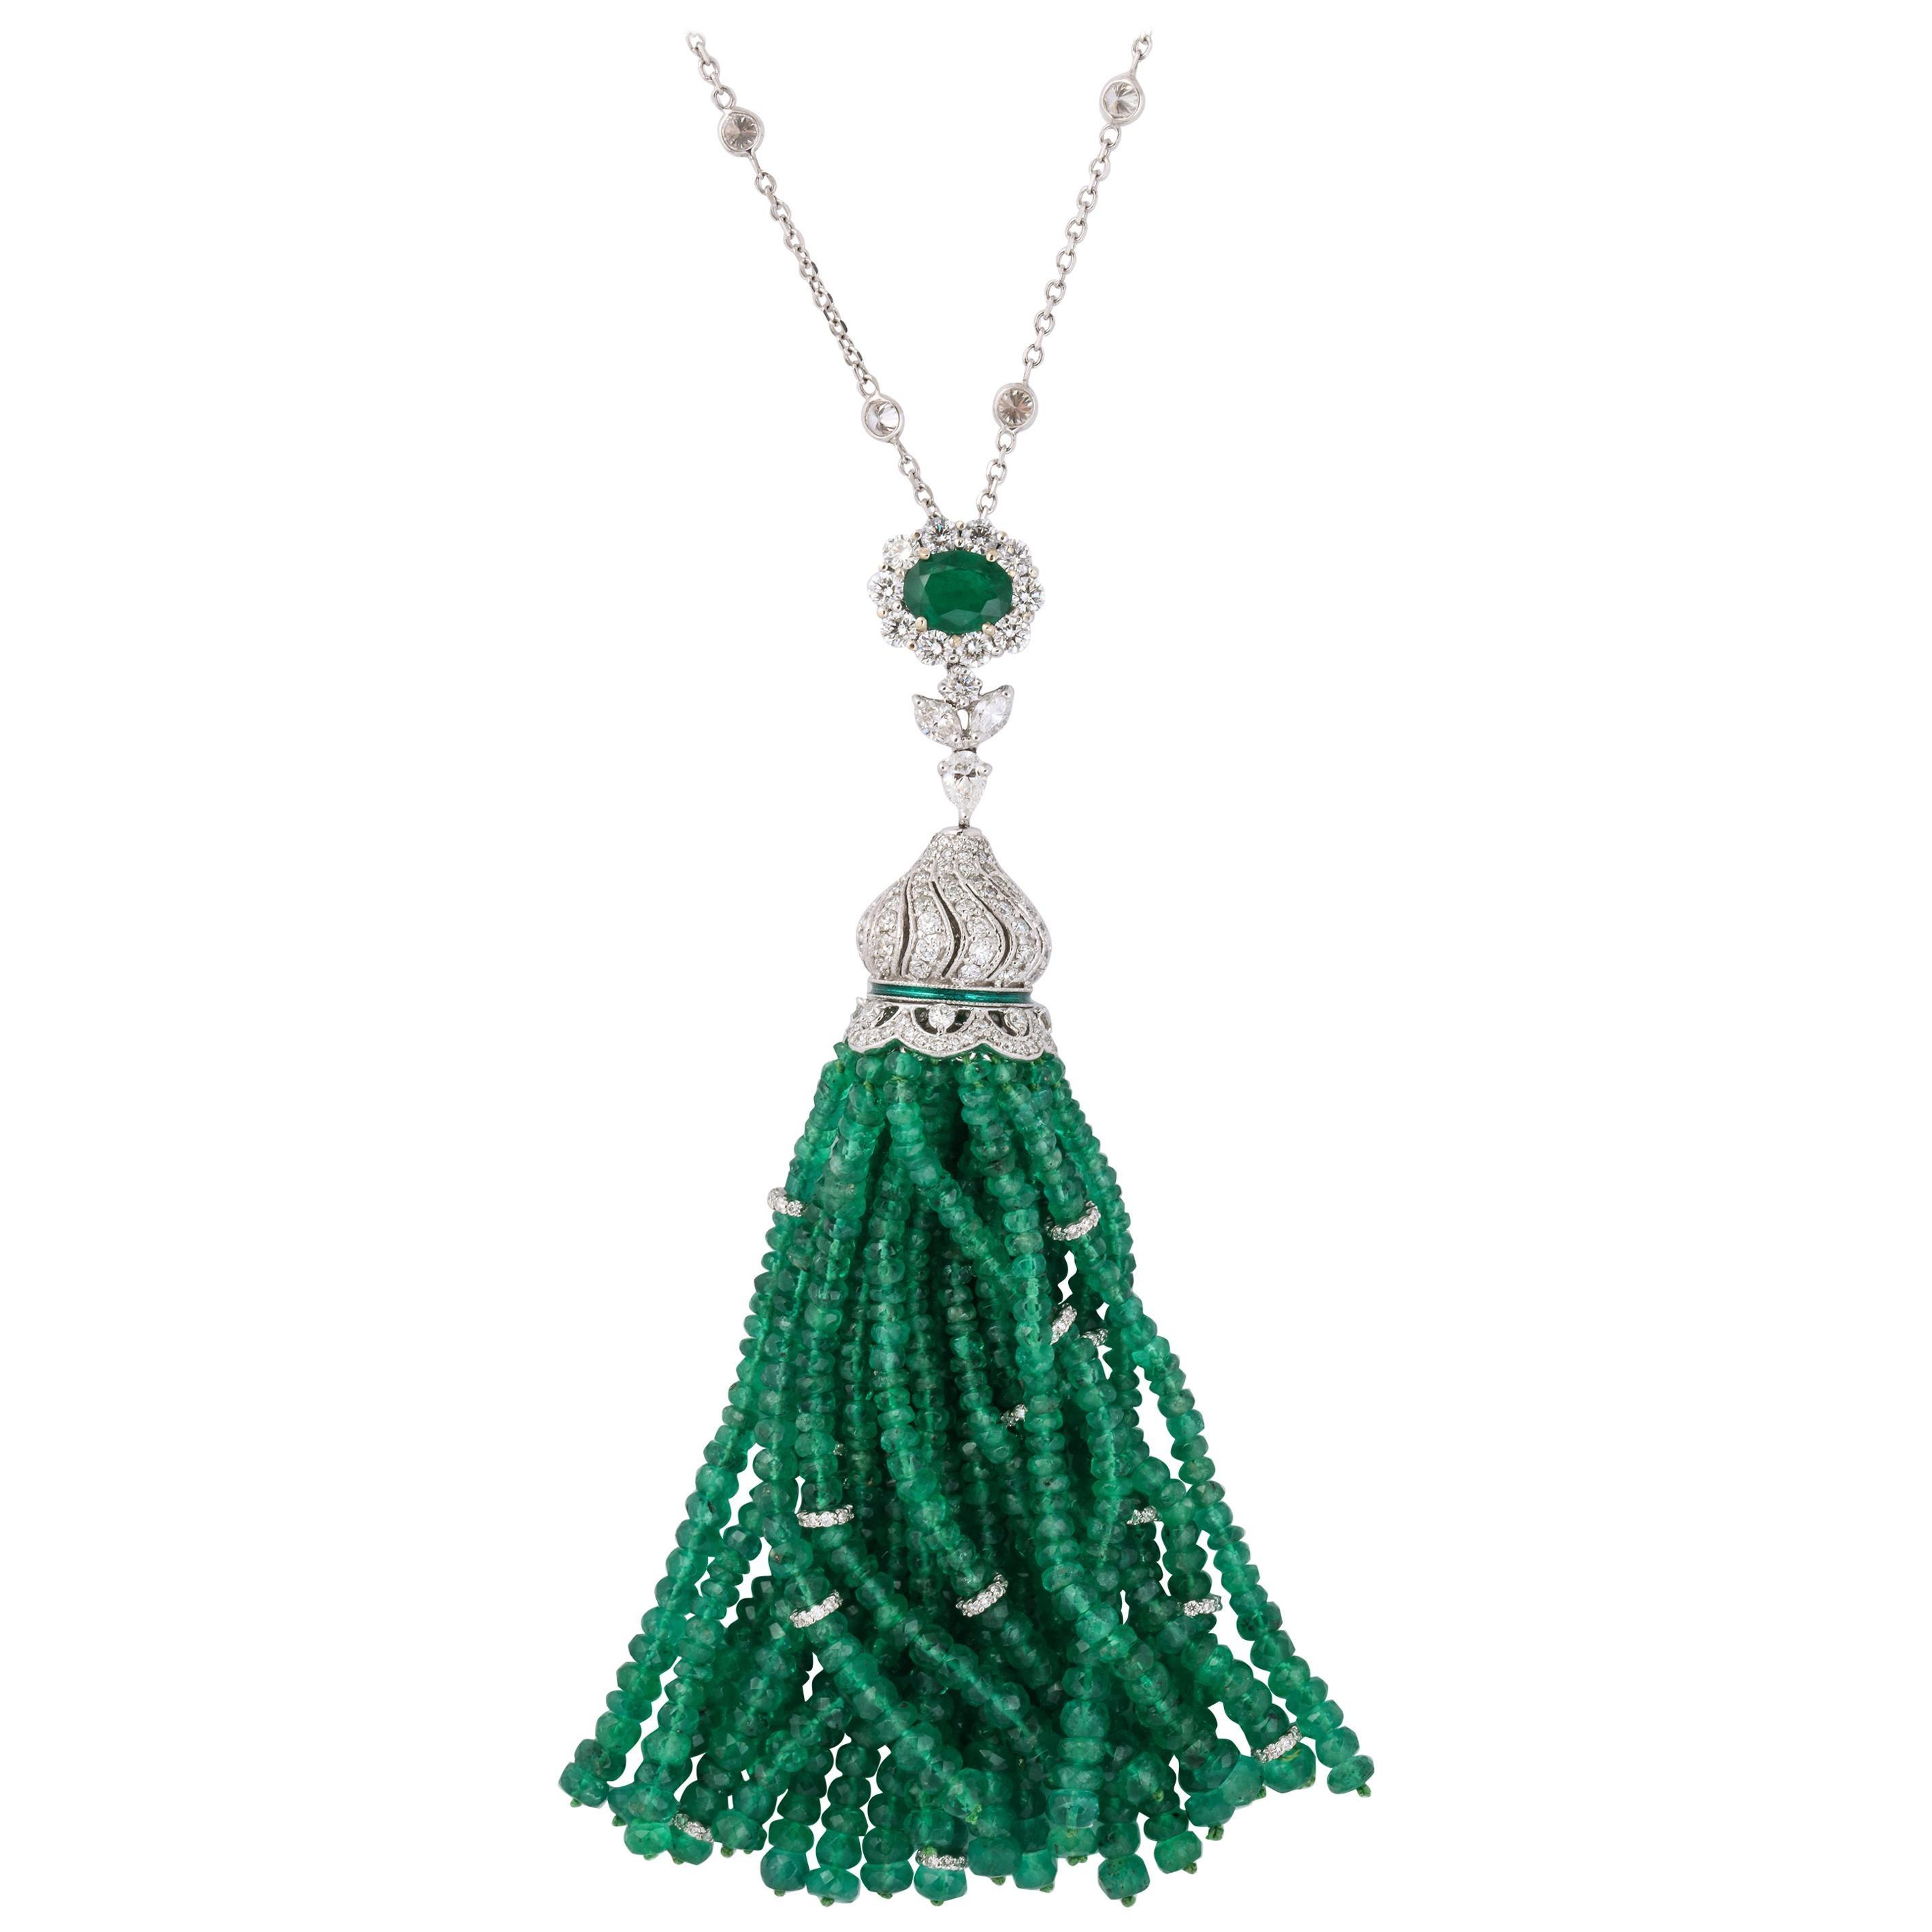 Emerald and Diamond Tassel Necklace